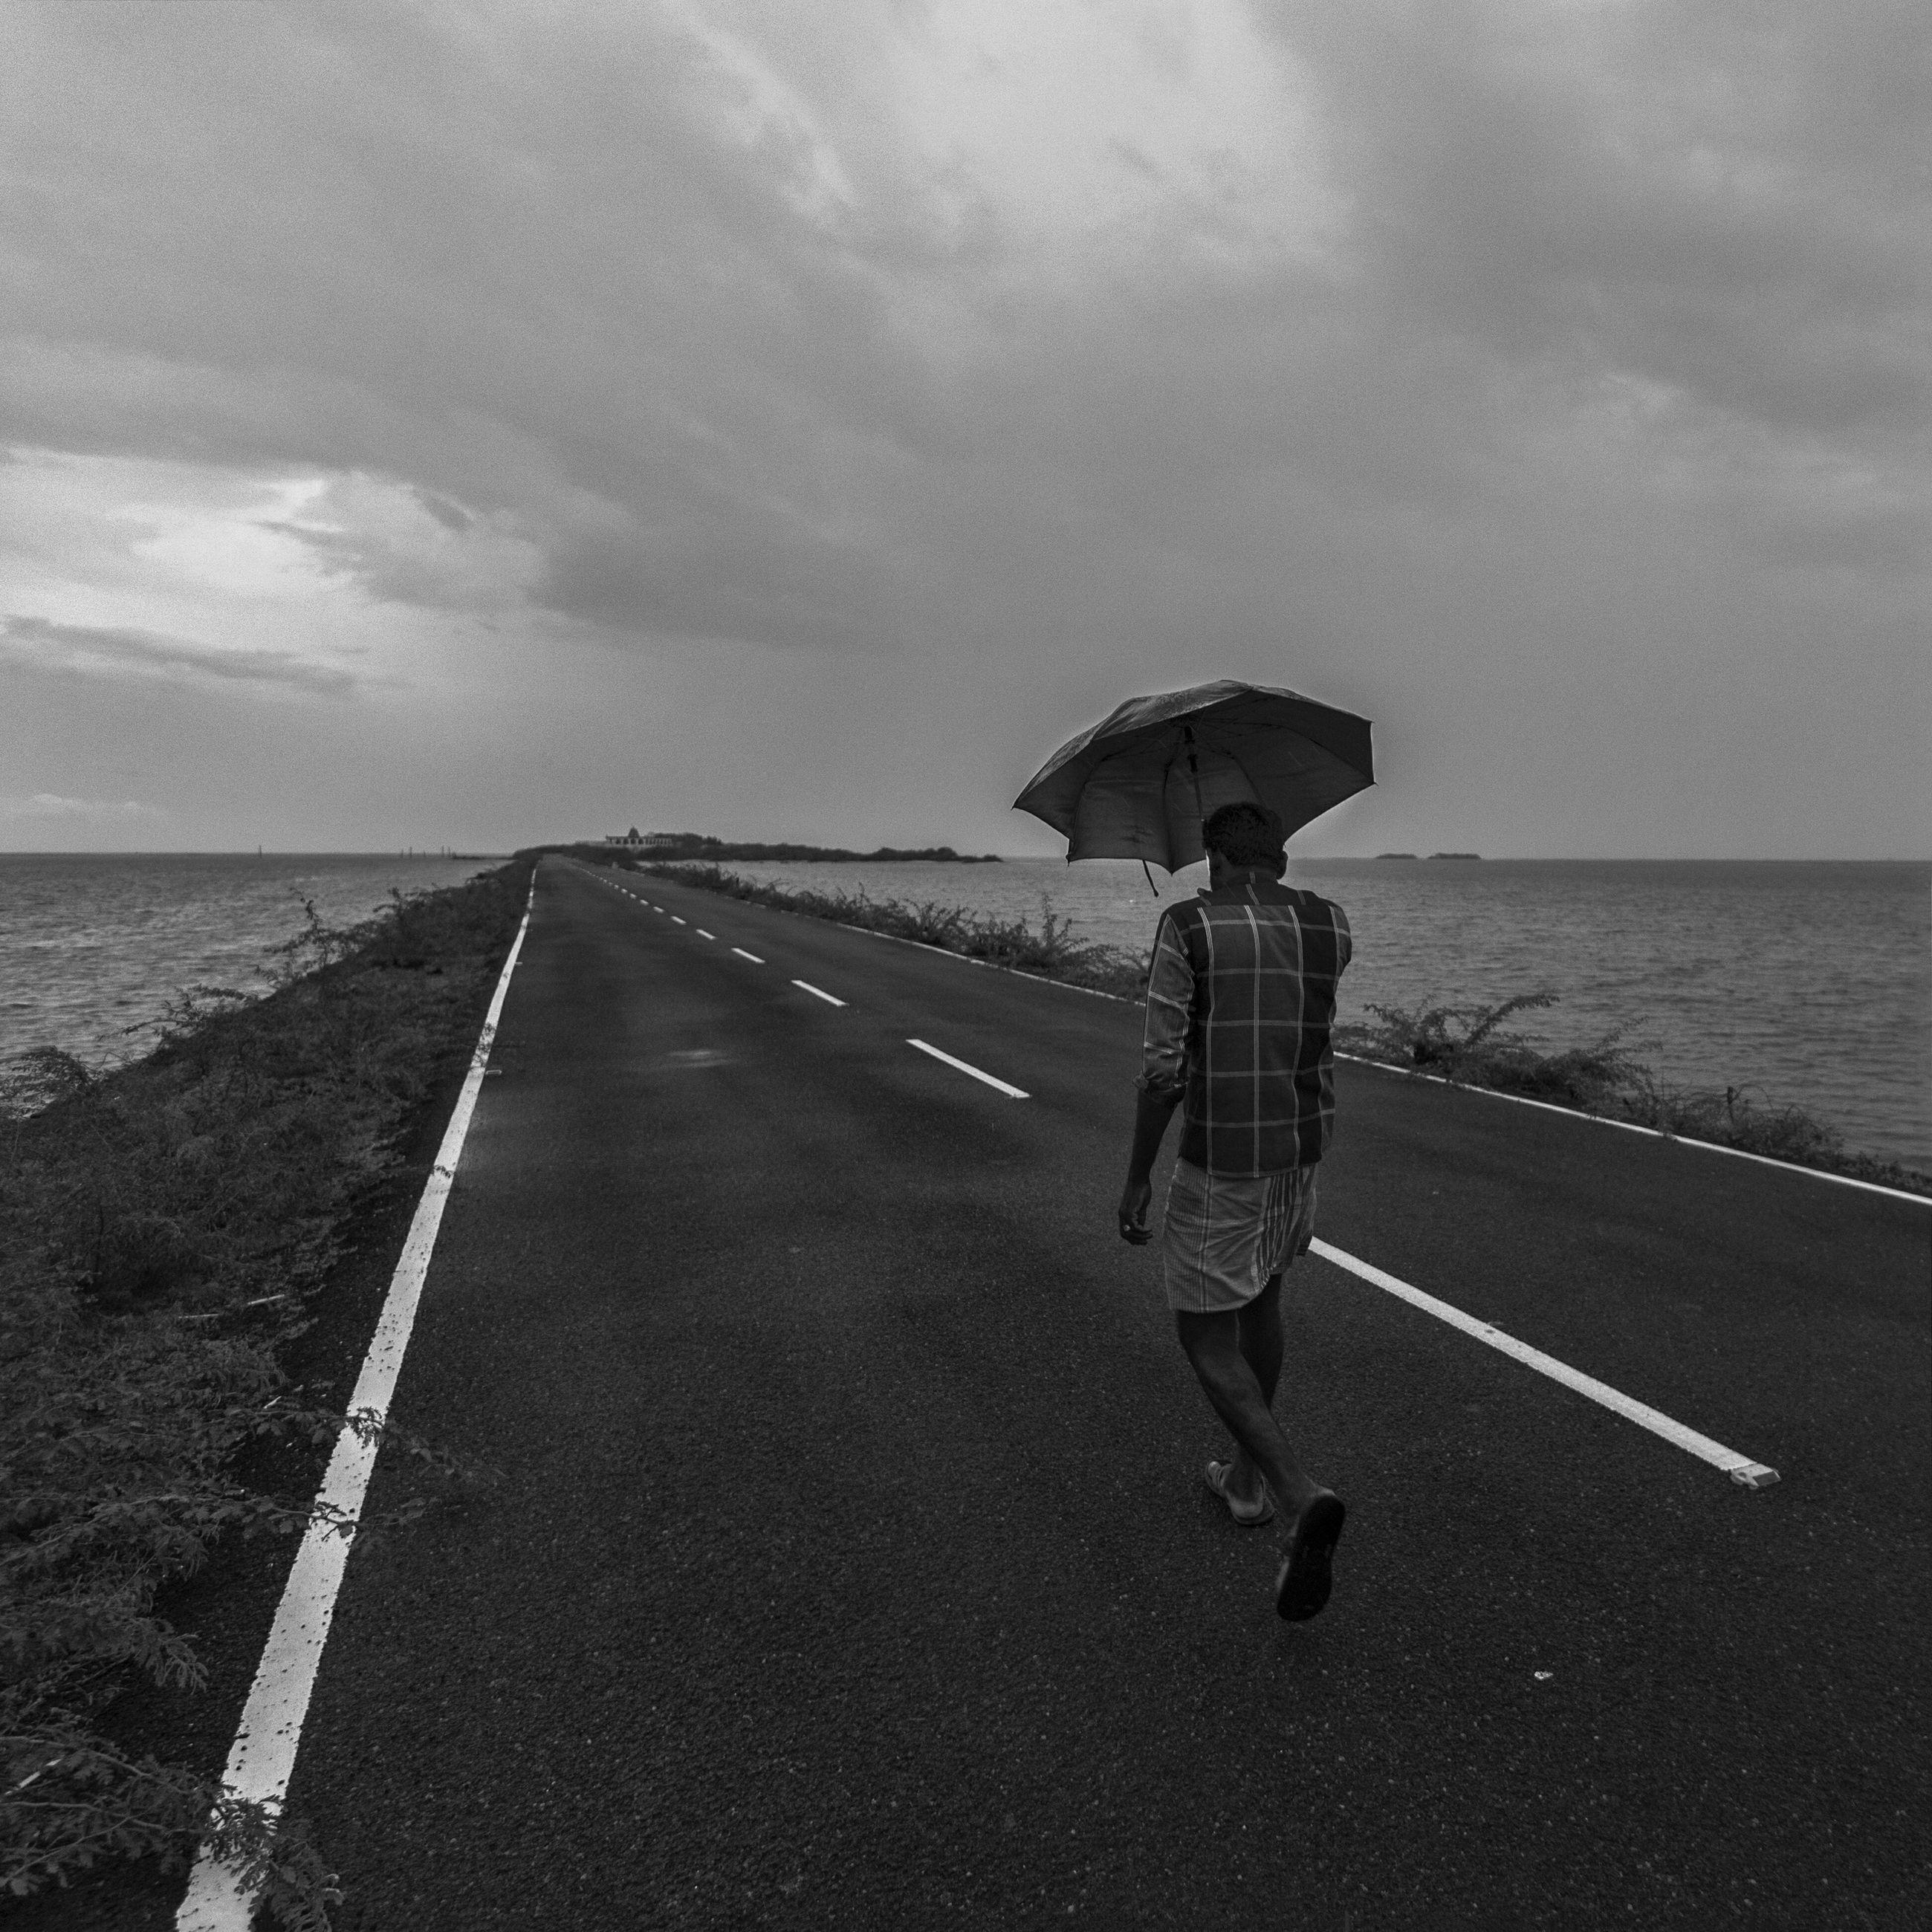 Rear view of man under umbrella on road leading towards sea